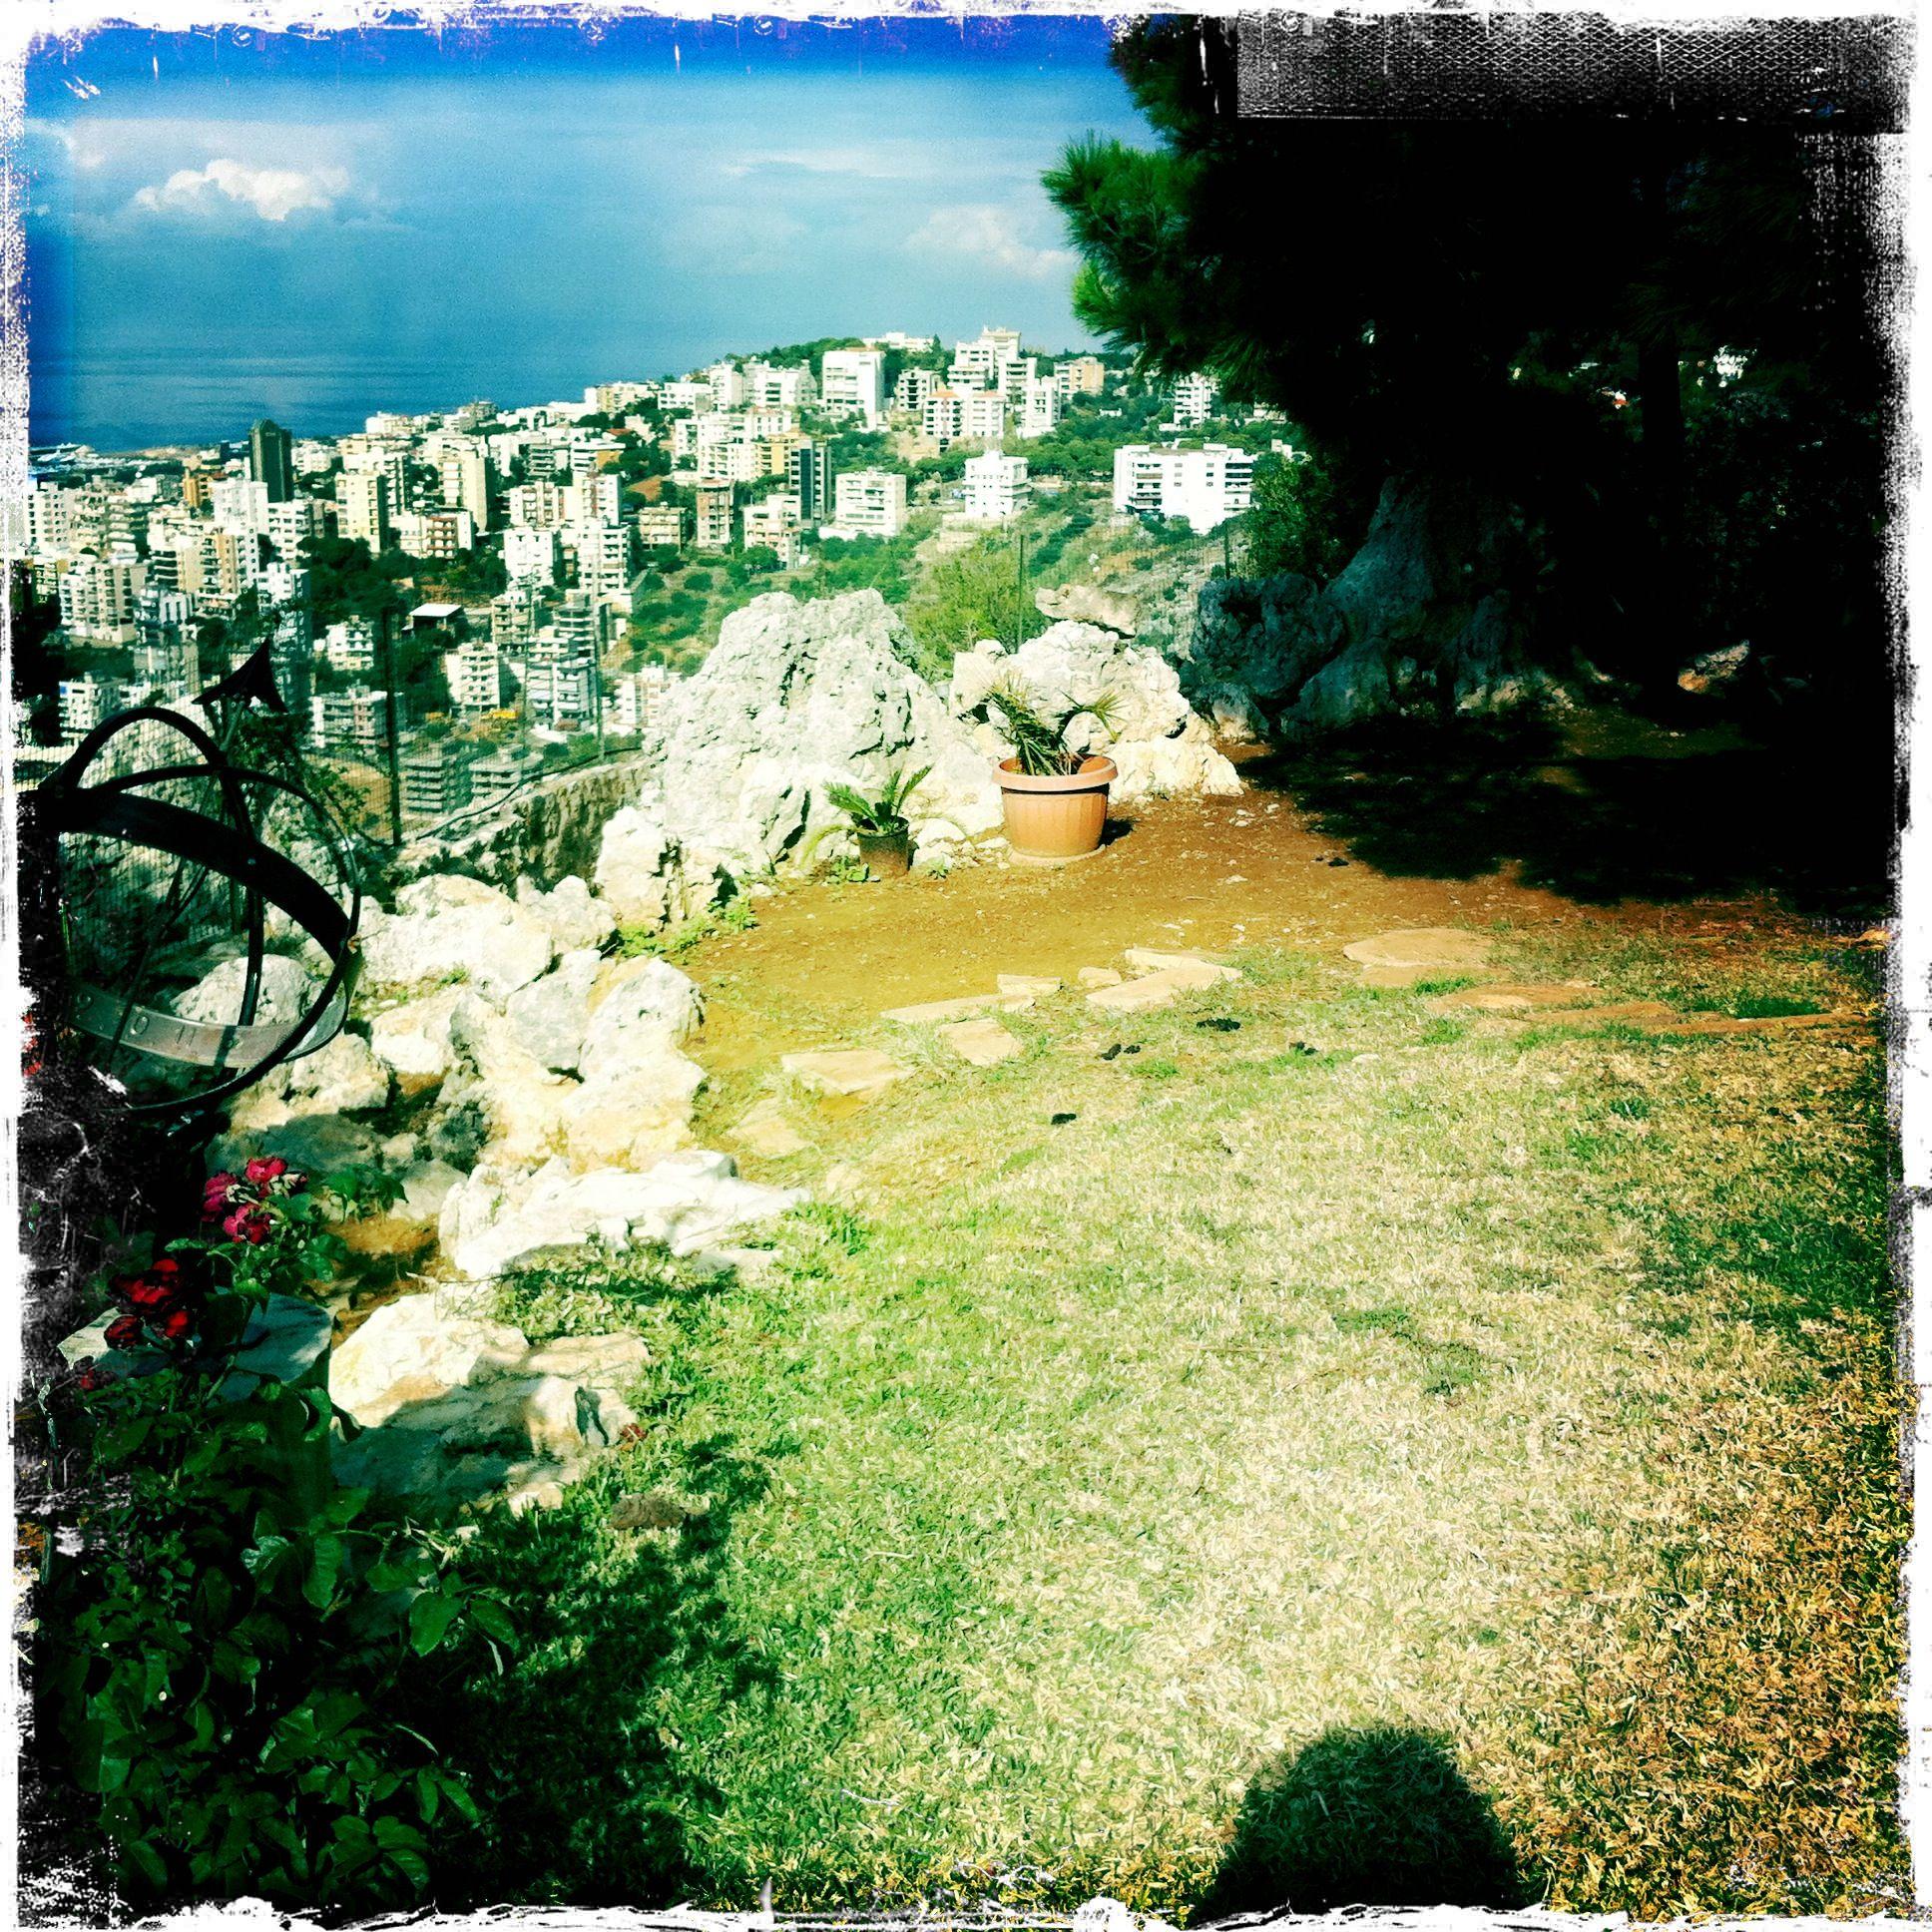 Bsalim, Lebanon